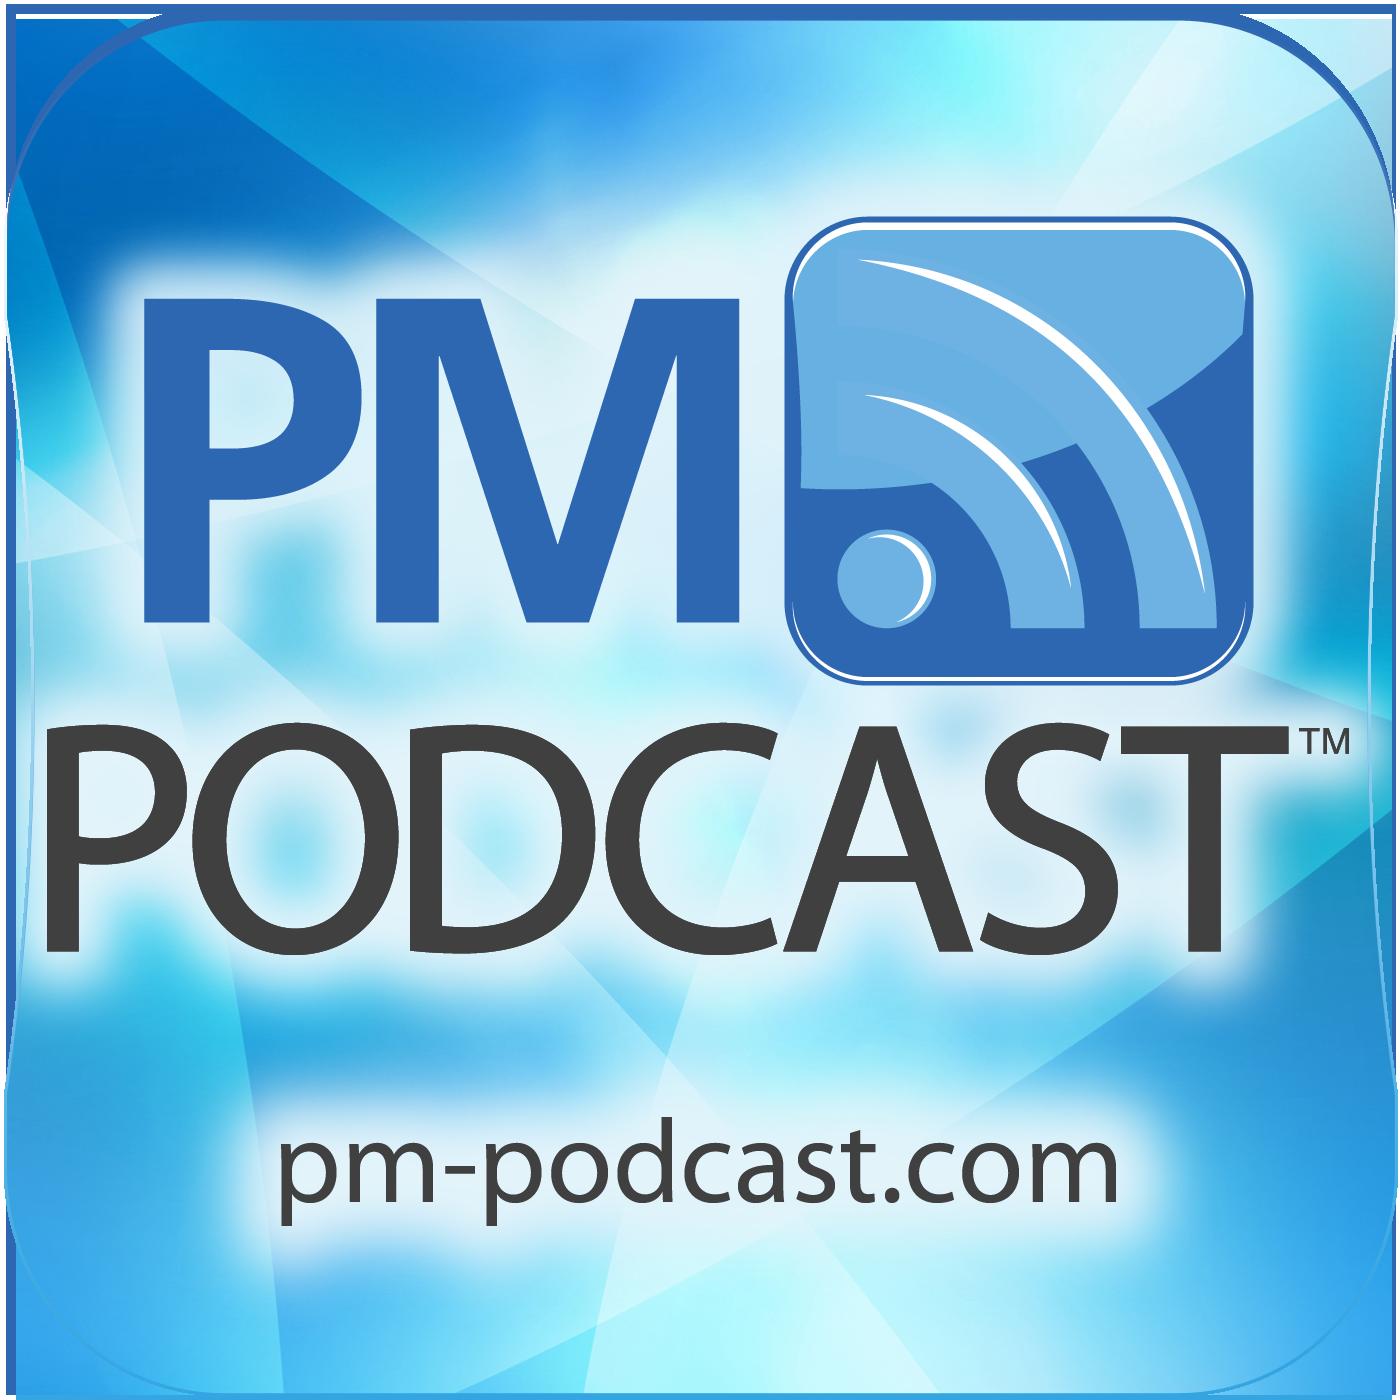 pm-podcast-itunes-tr